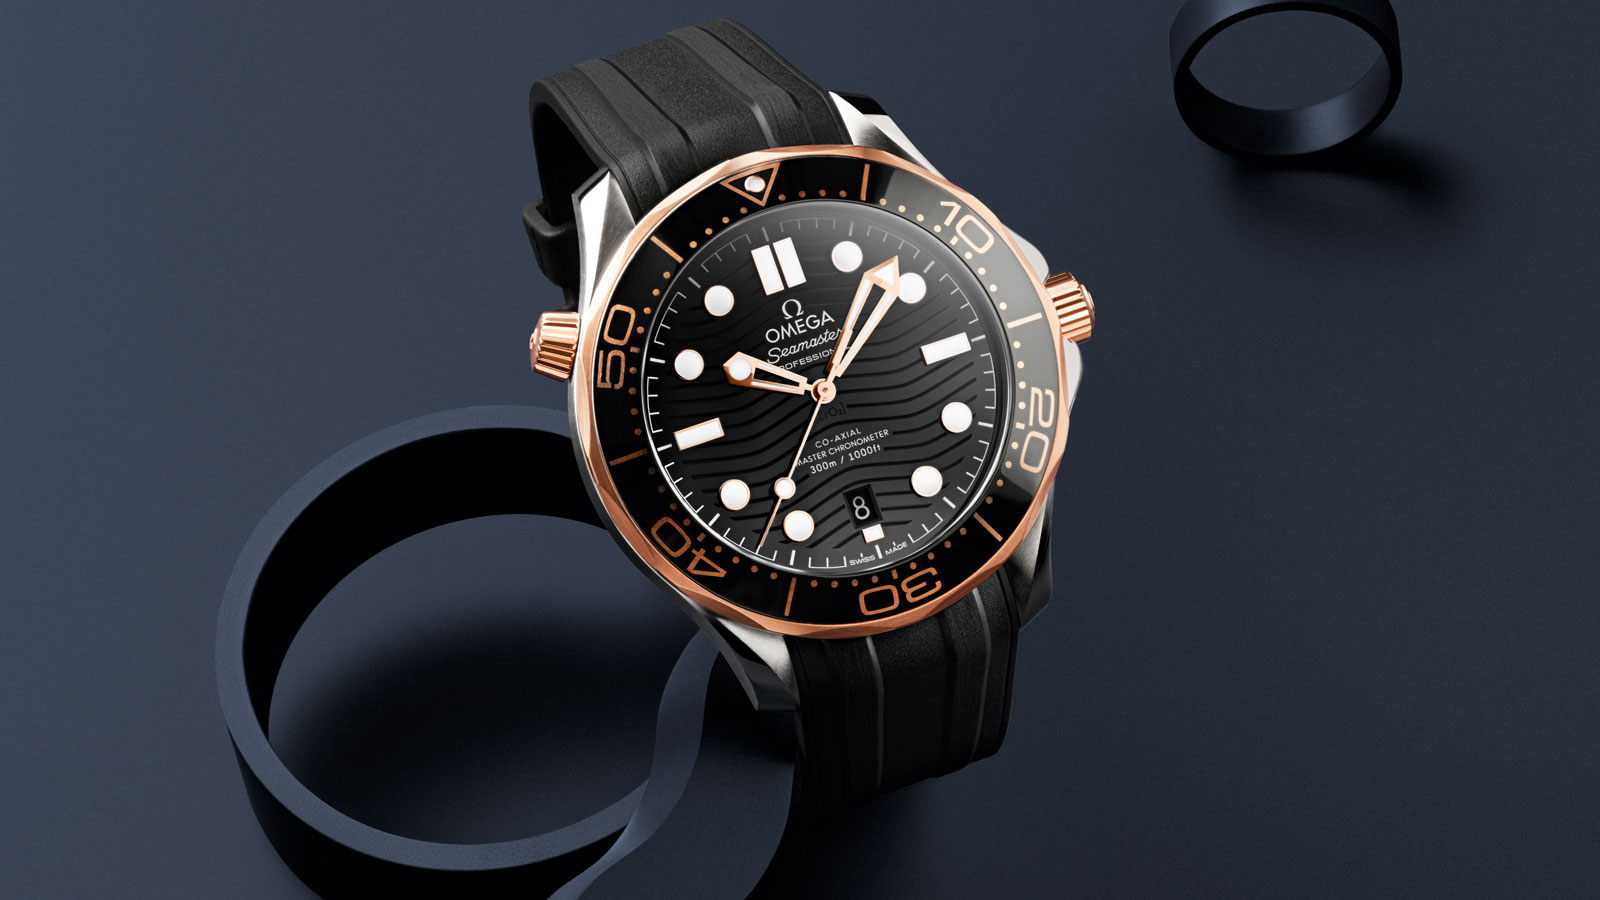 Seamaster 300米潜水表 300米潜水表 欧米茄至臻天文台表42毫米 - 210.22.42.20.01.002 - 查看 1